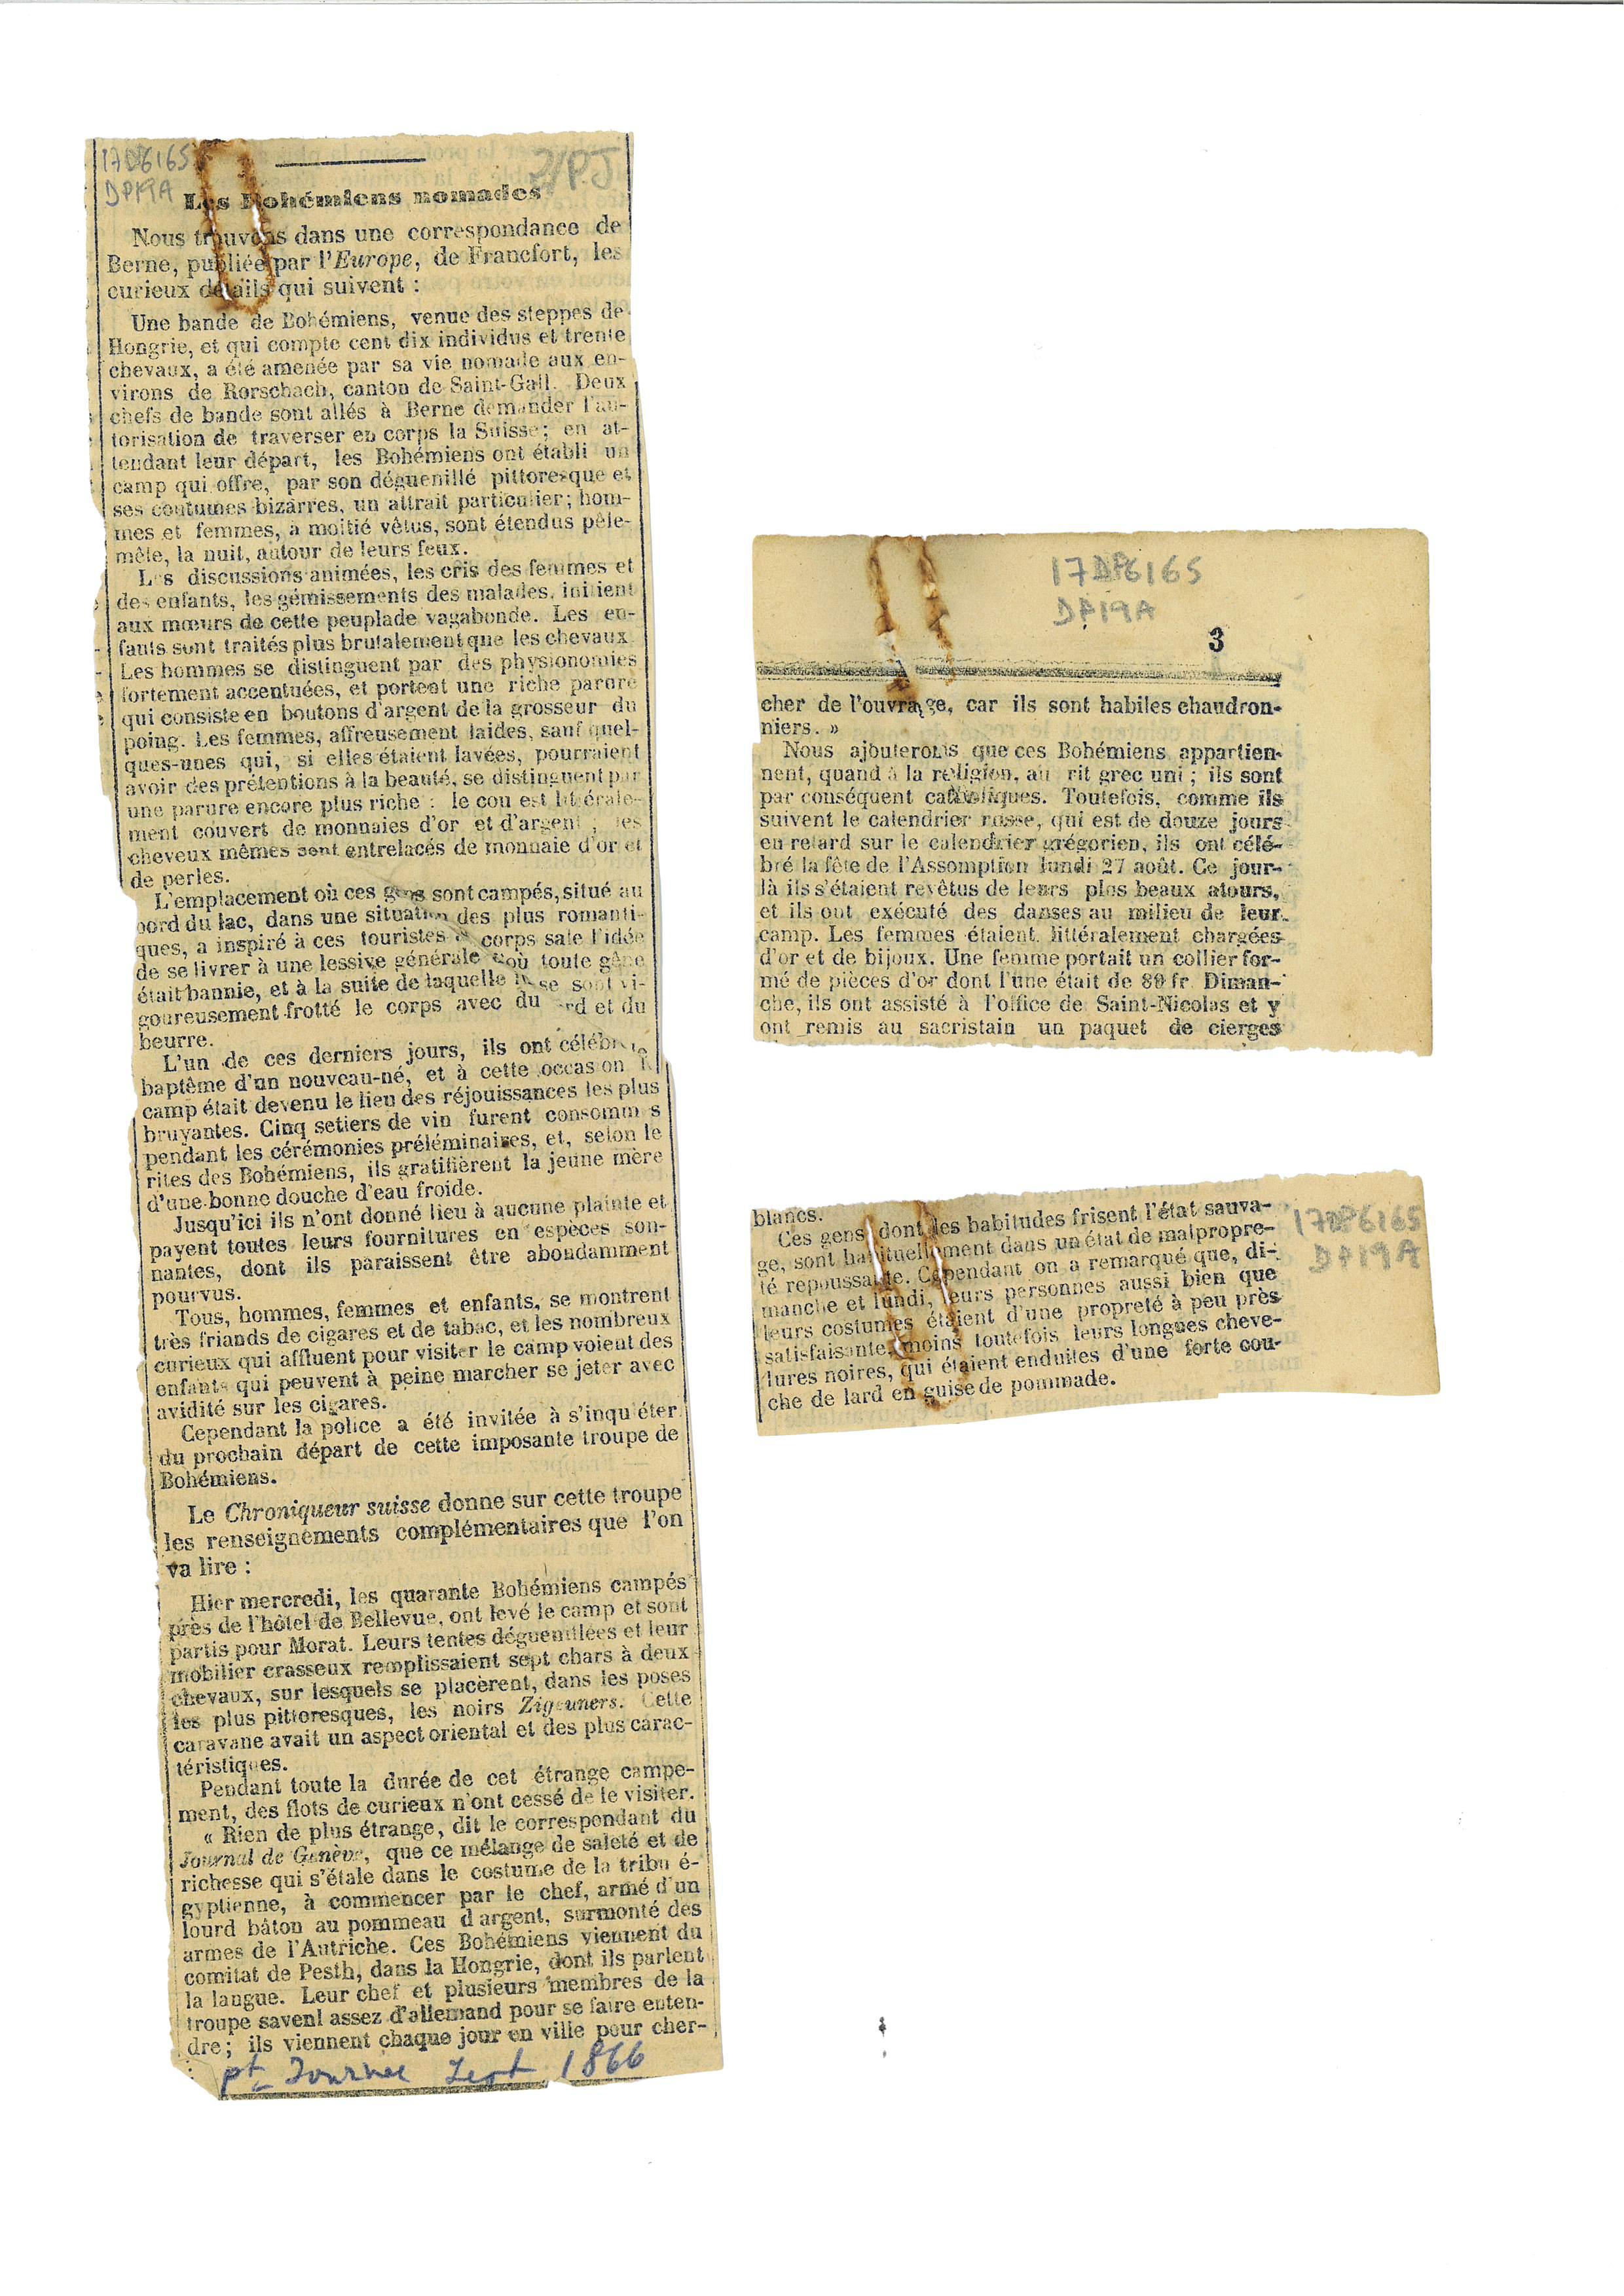 p.3.jpg - image/jpeg